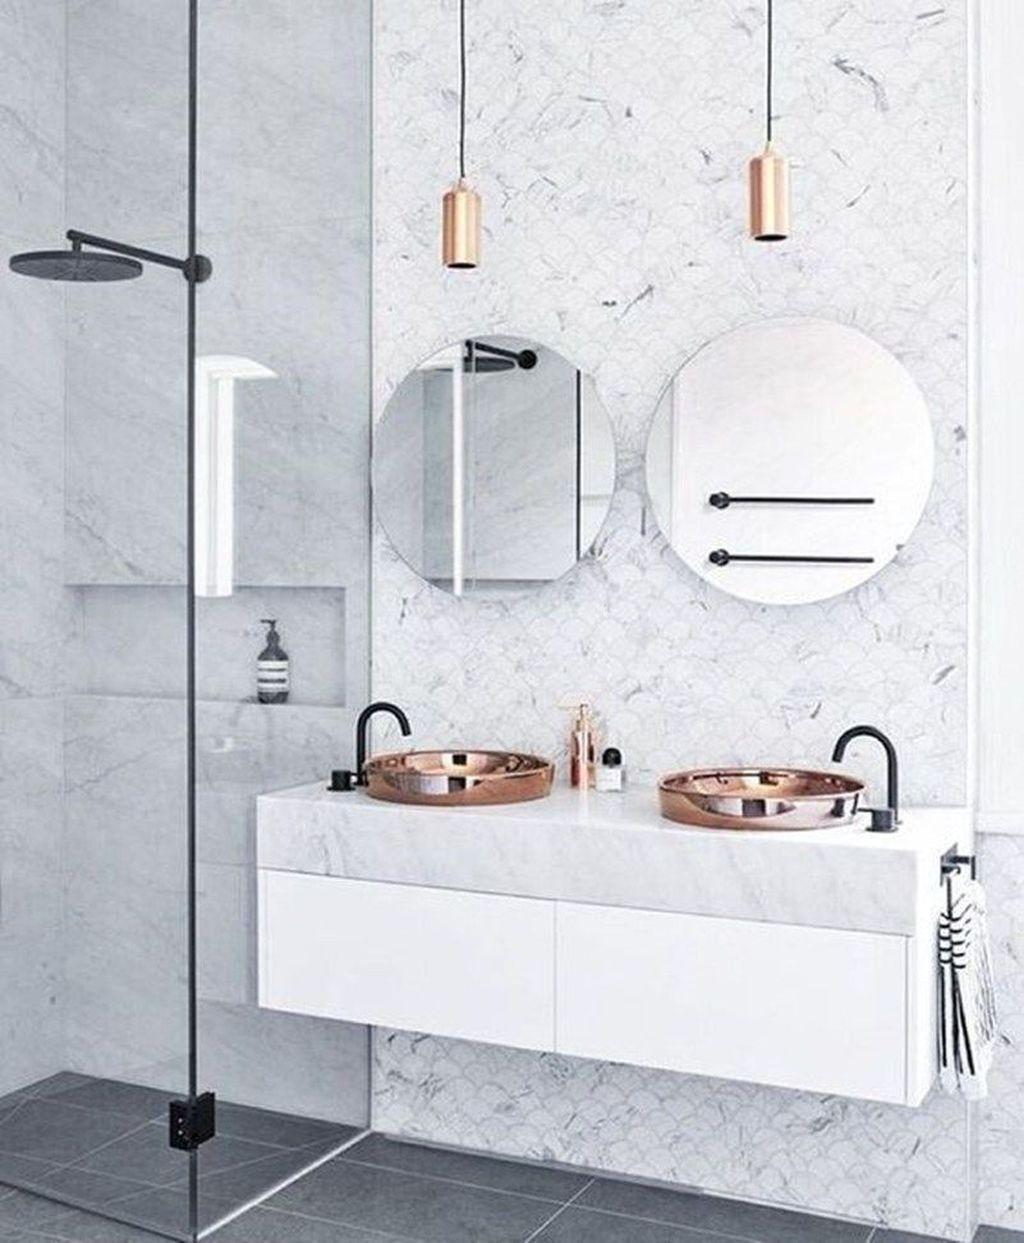 Fabulous Minimalist Bathroom Decor Ideas That Become Everyones Dream 17